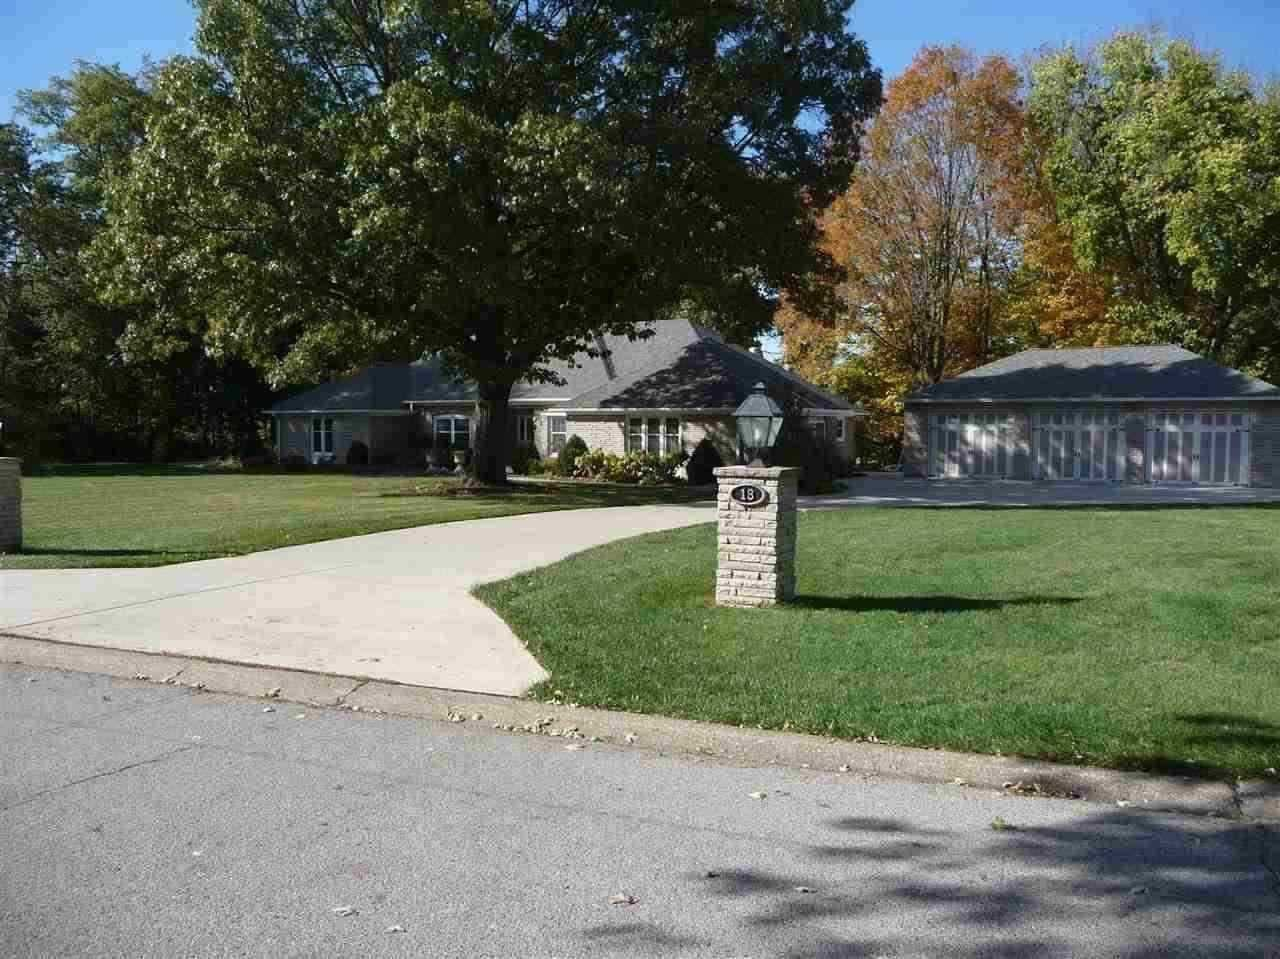 Real Estate for Sale, ListingId: 29099214, Bettendorf,IA52722